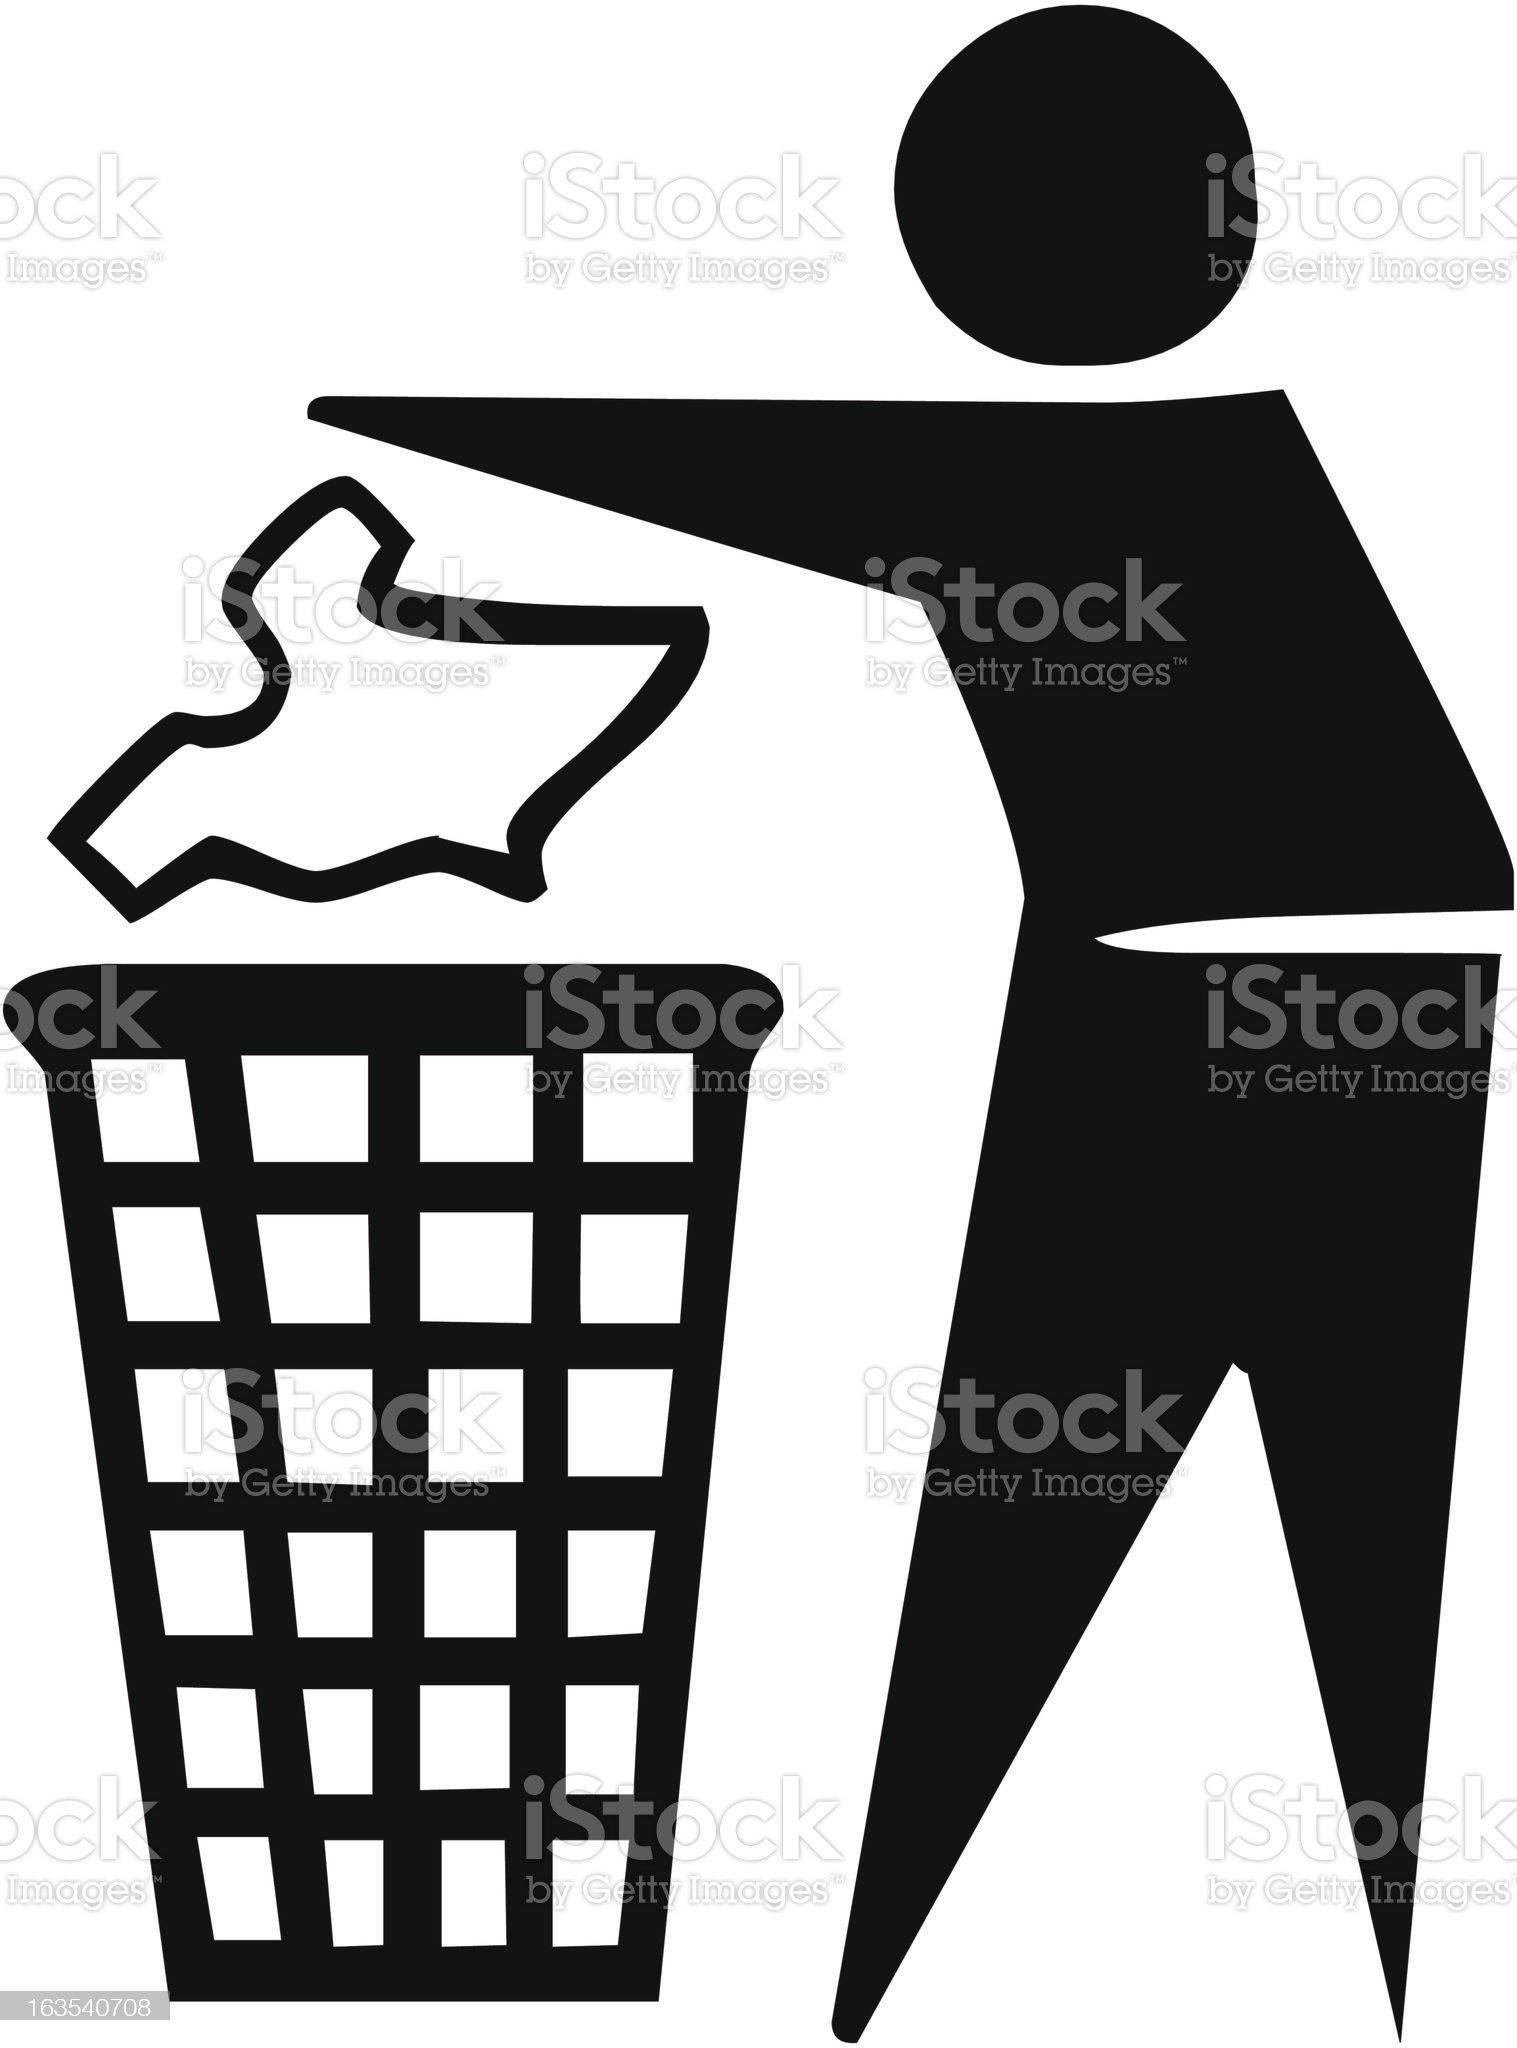 Throw Trash royalty-free stock vector art